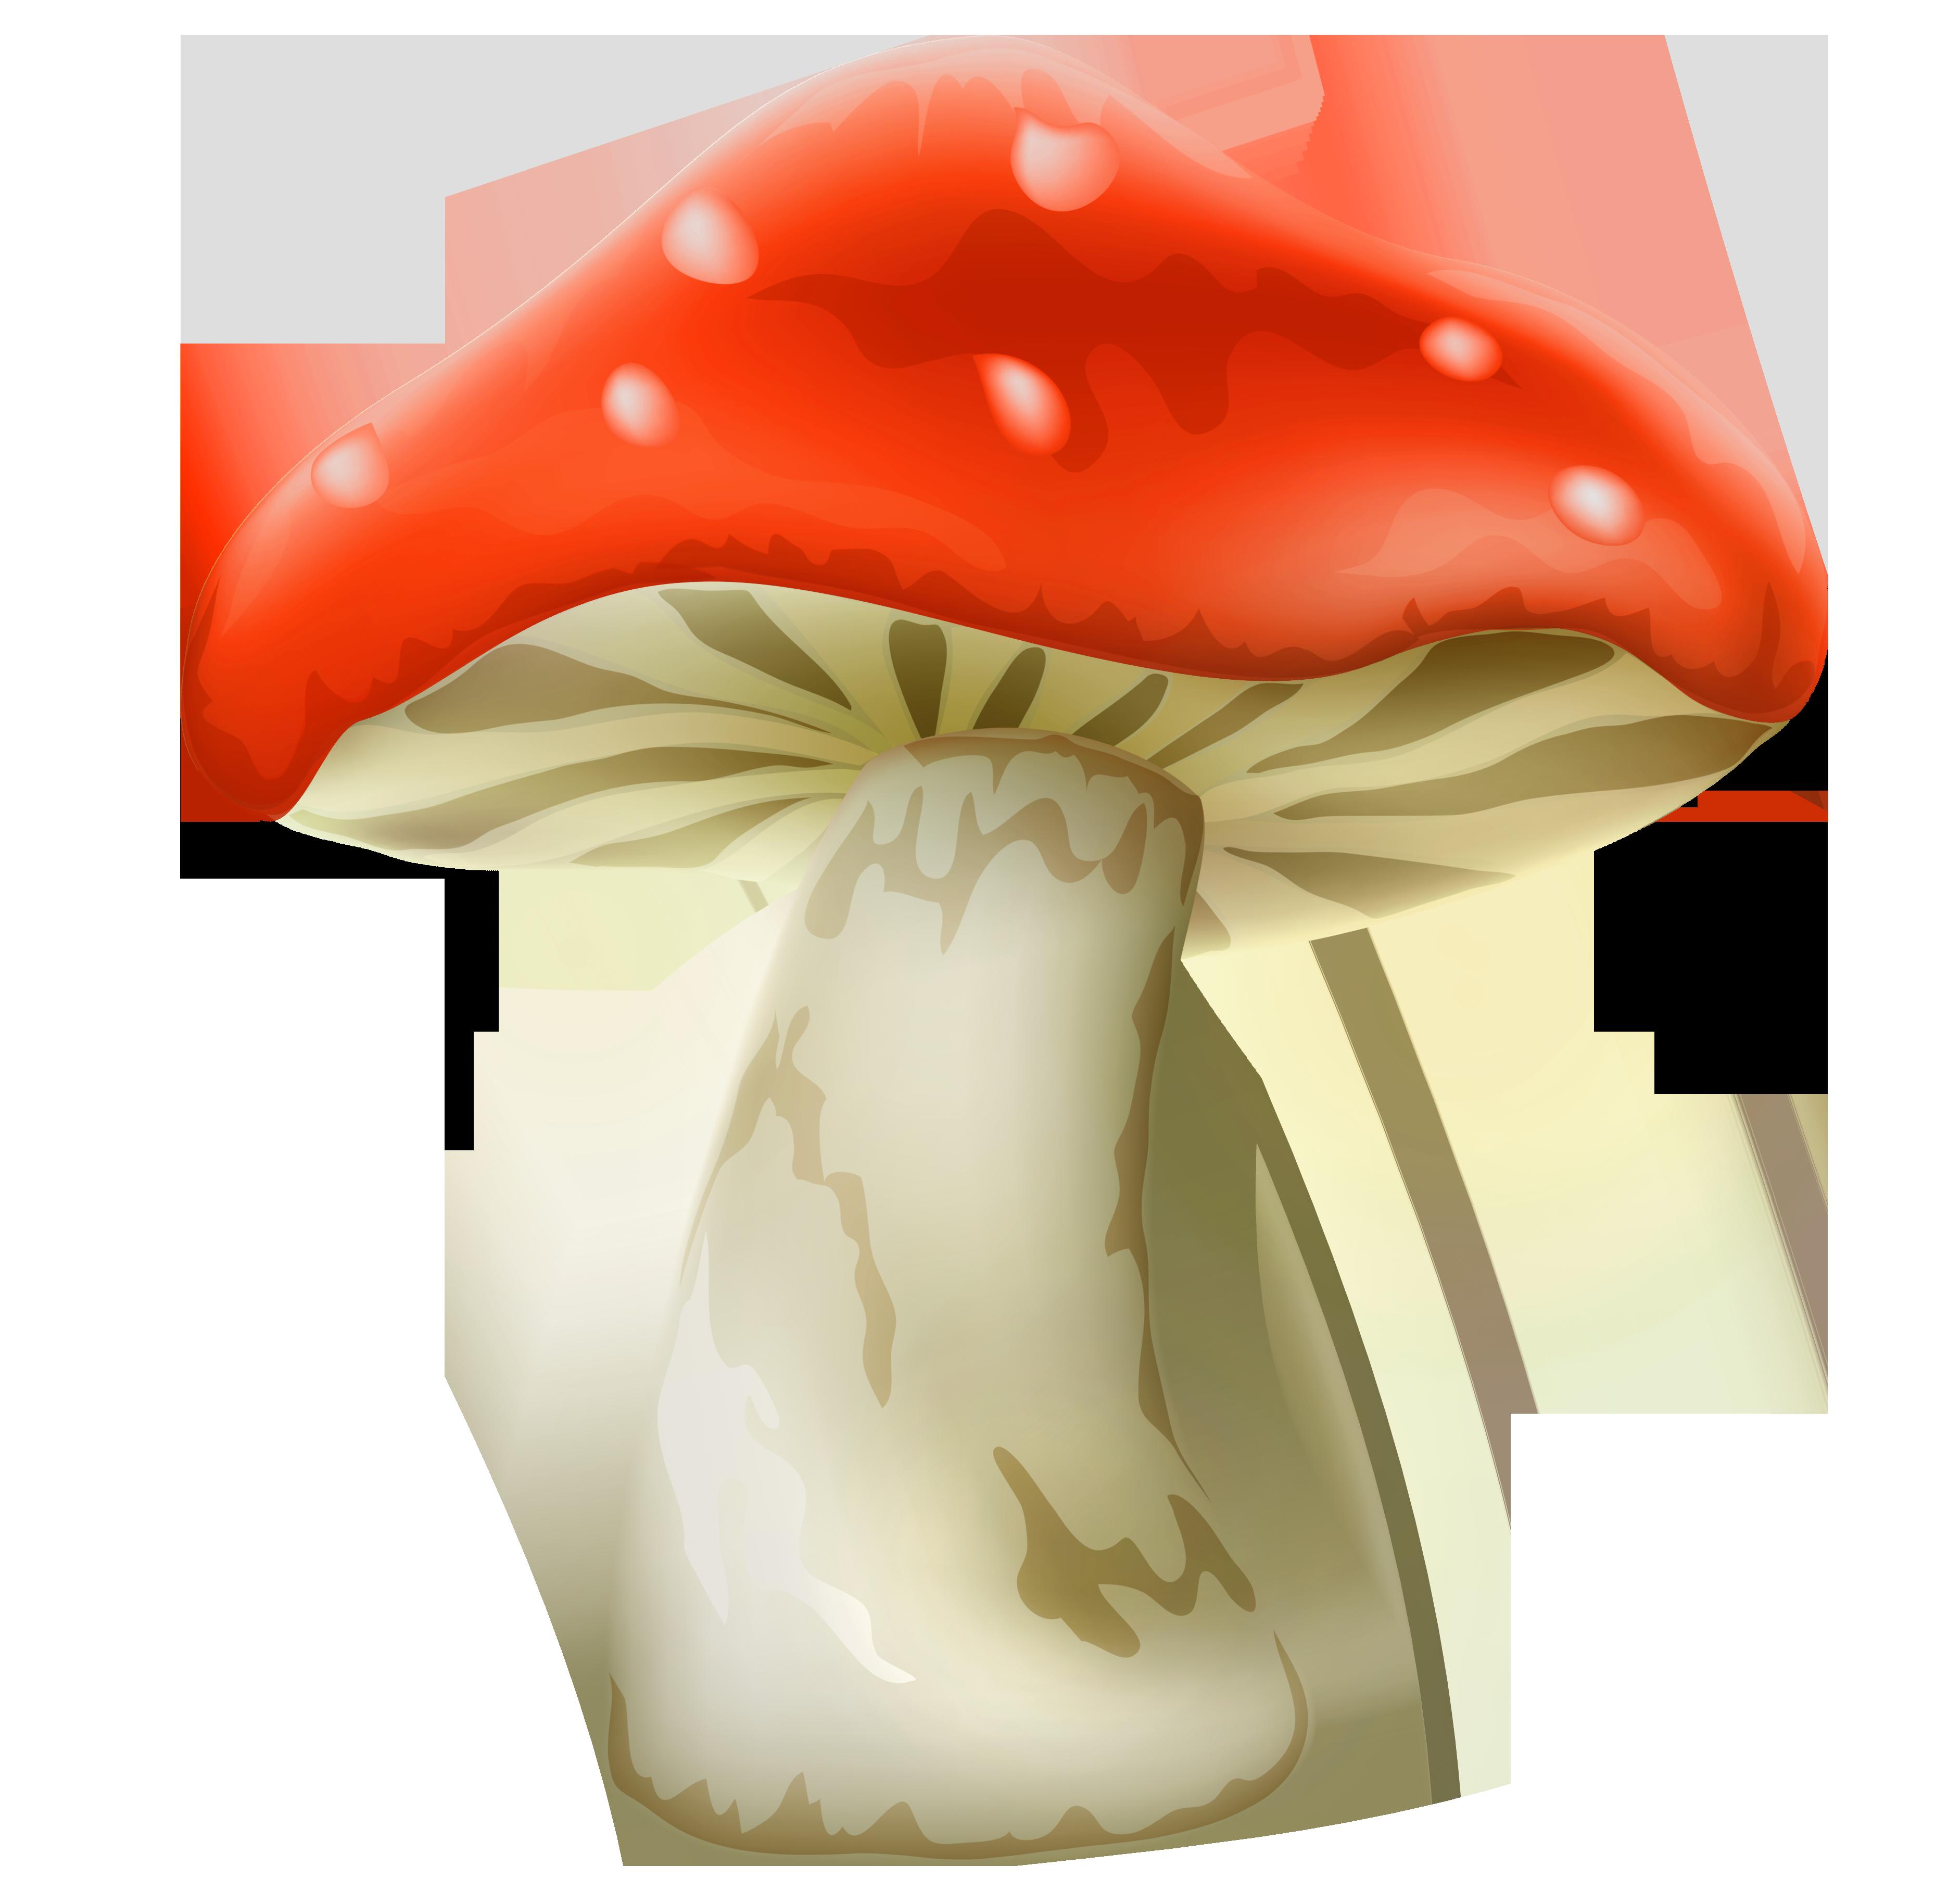 pin Mushroom clipart red mushroom #1 - PNG Toadstool - Toadstool PNG HD